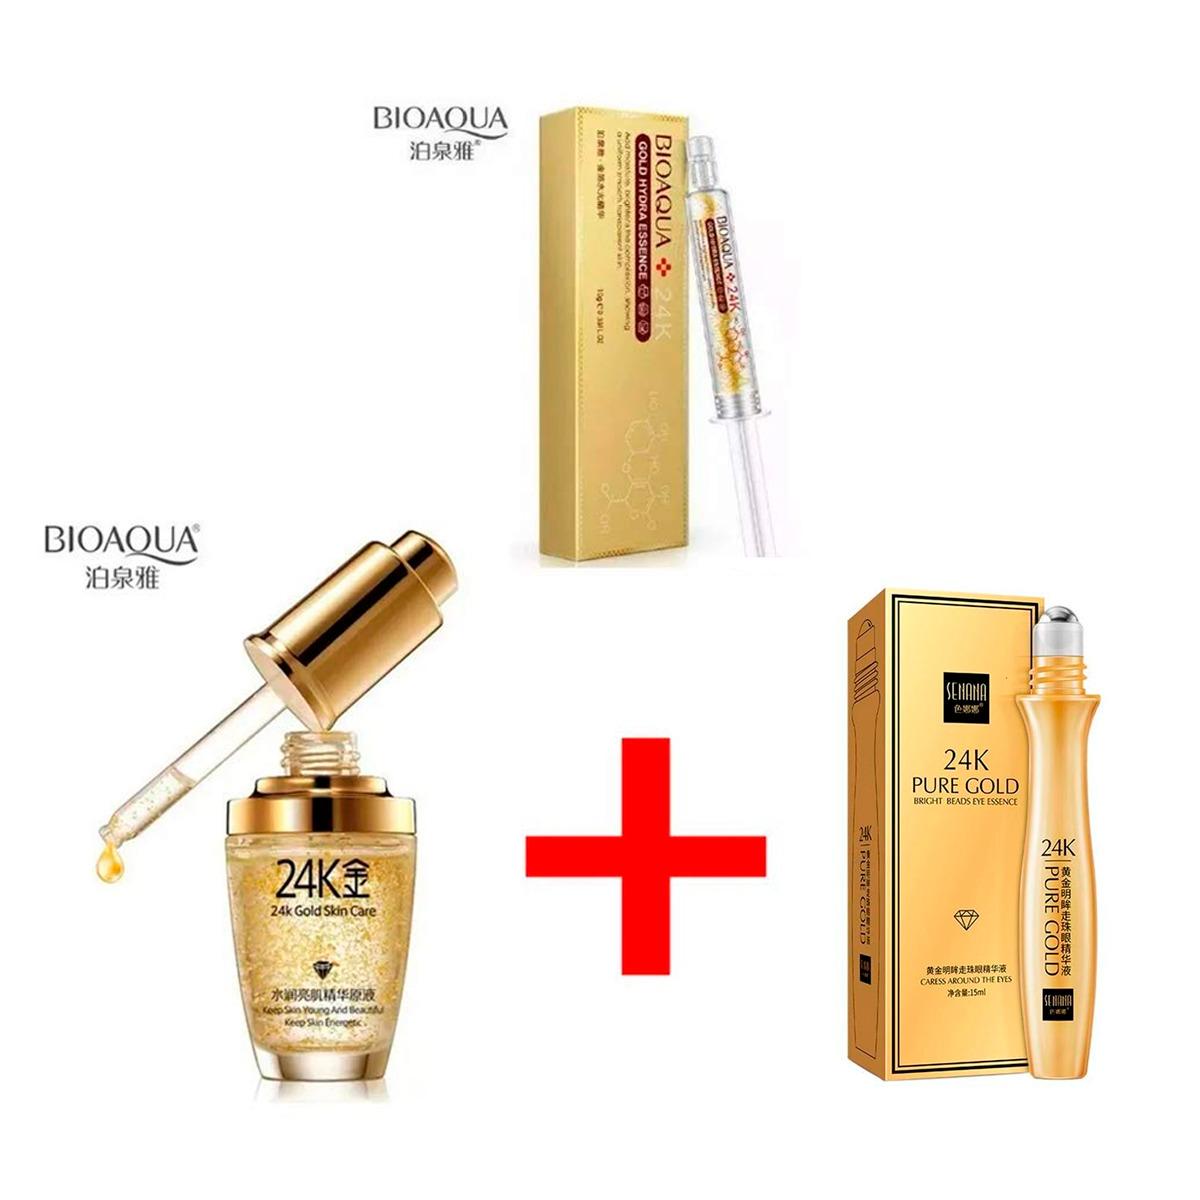 Kit Bioaqua 24k Gold Essence Colageno Acido Hialuronico 3pz